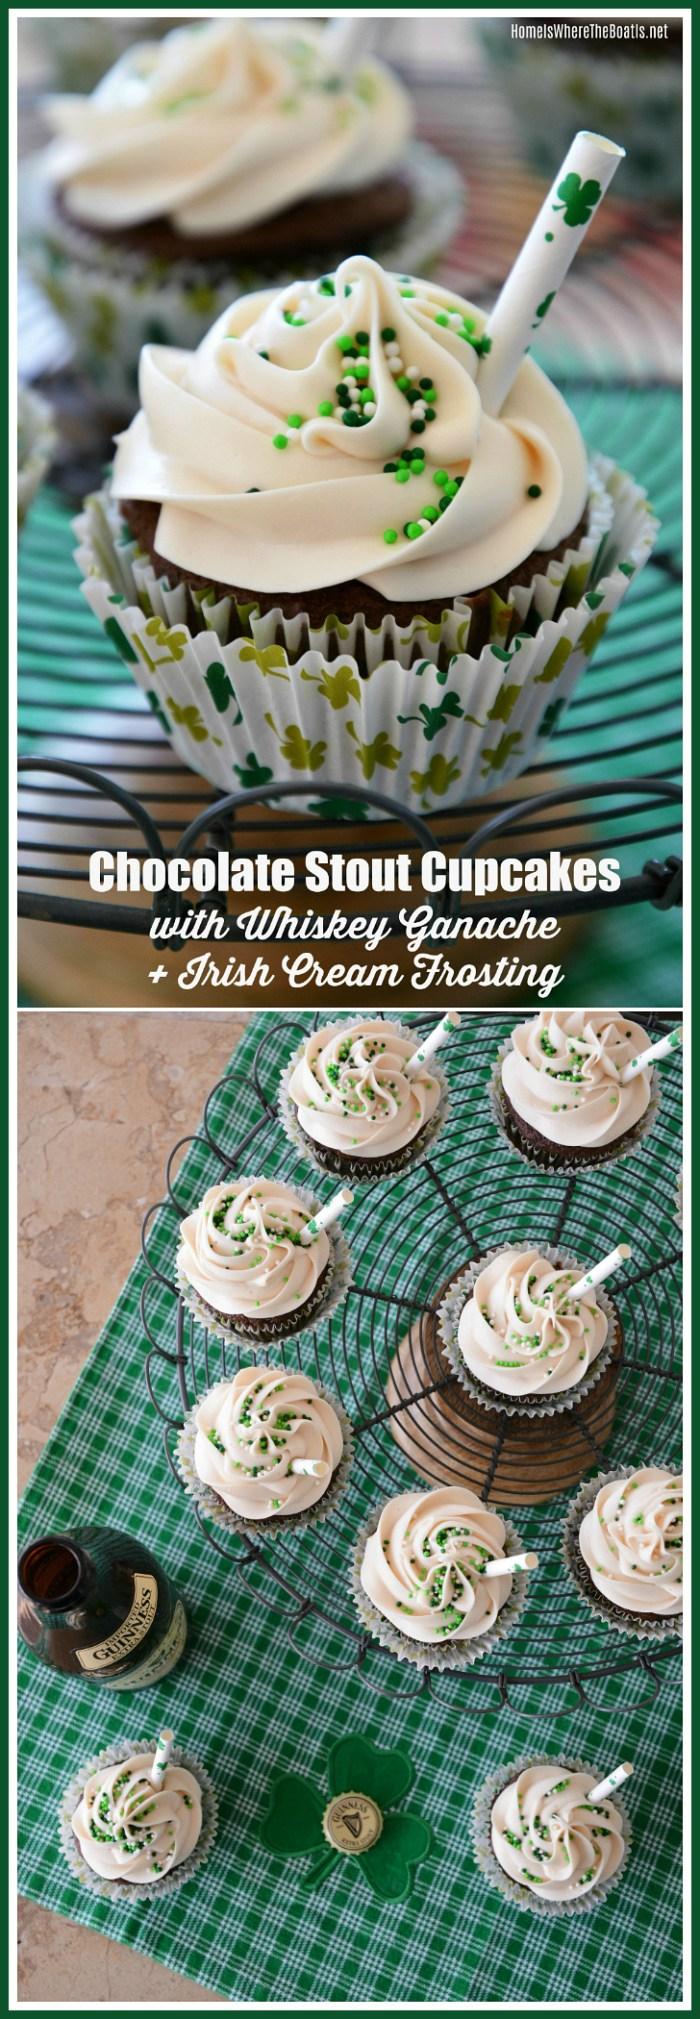 Eat, Drink and Be Irish: Chocolate Stout Cupcakes with Whiskey Ganache and Irish Cream Frosting | ©homeiswheretheboatis.net #stpatricksday #guinness #recipe #cupcake #Irish